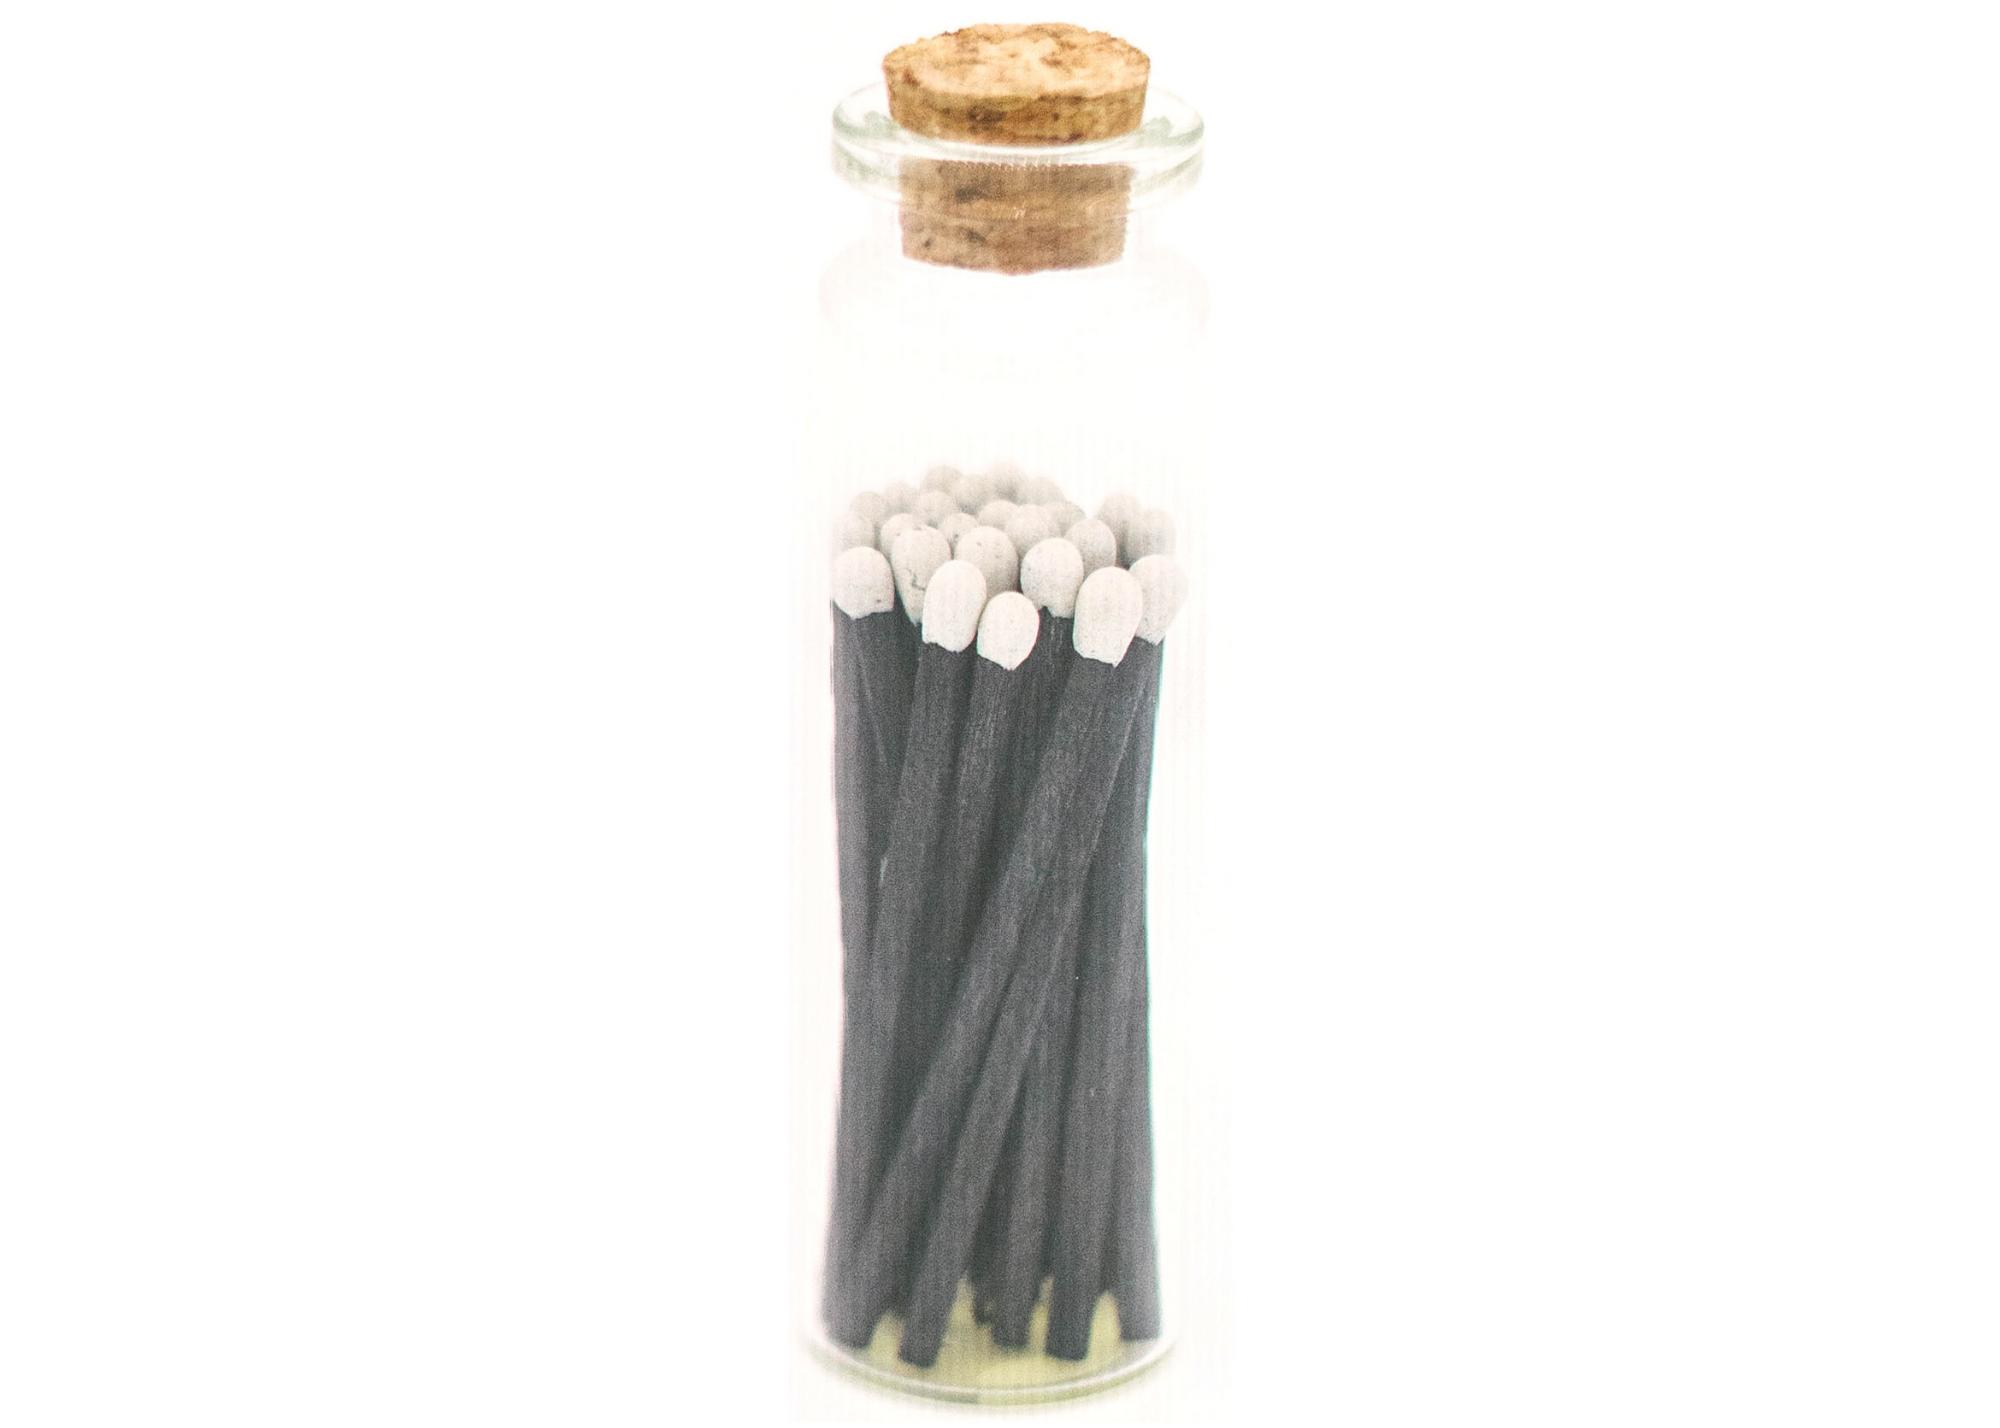 1.85in Tuxedo Decorative Matches In Jar w/ striker   Trada Marketplace